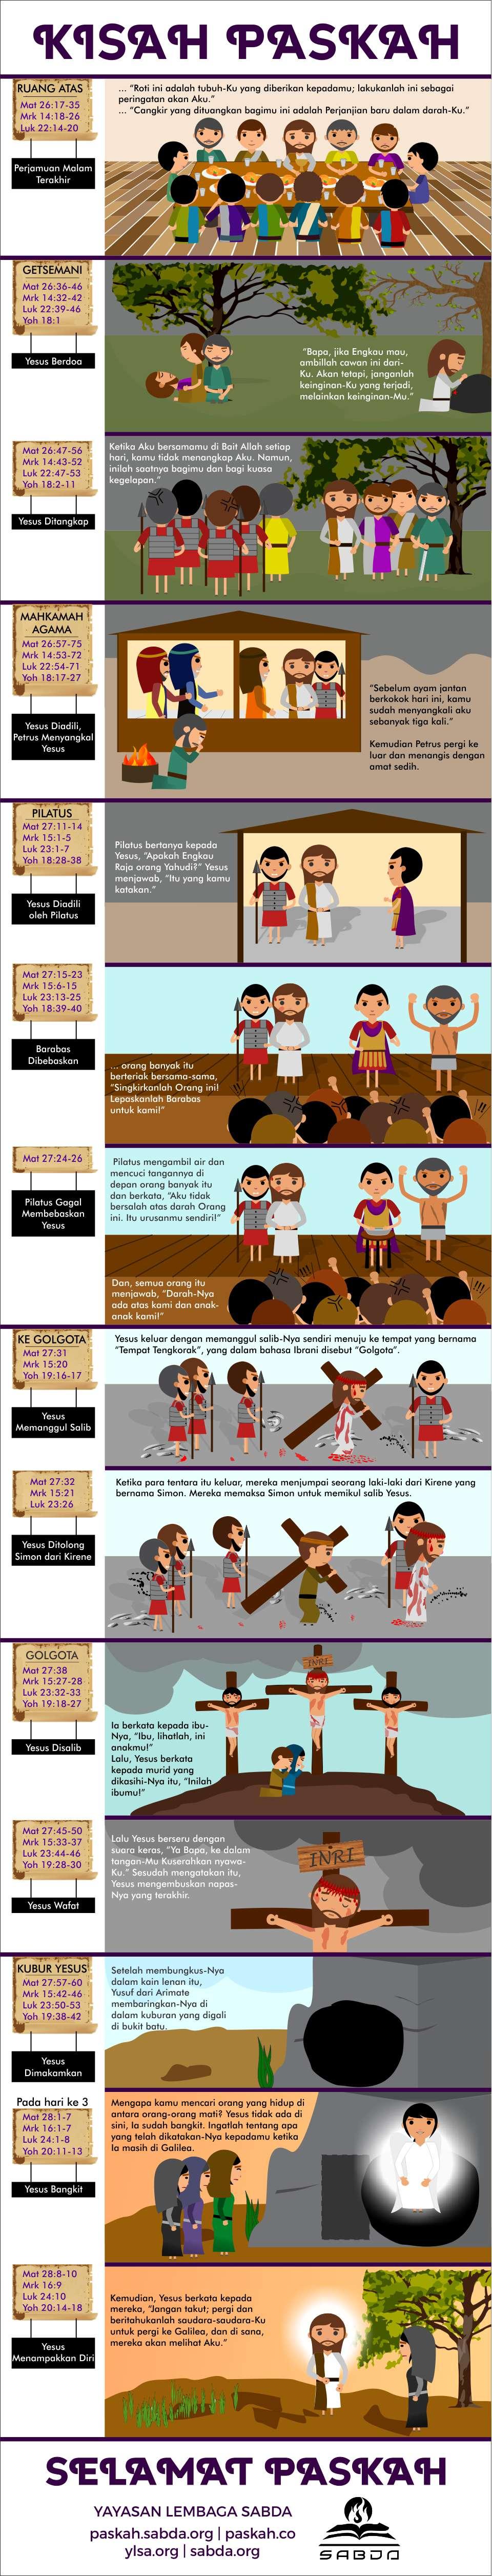 Gambar: Infografis Kisah Paskah